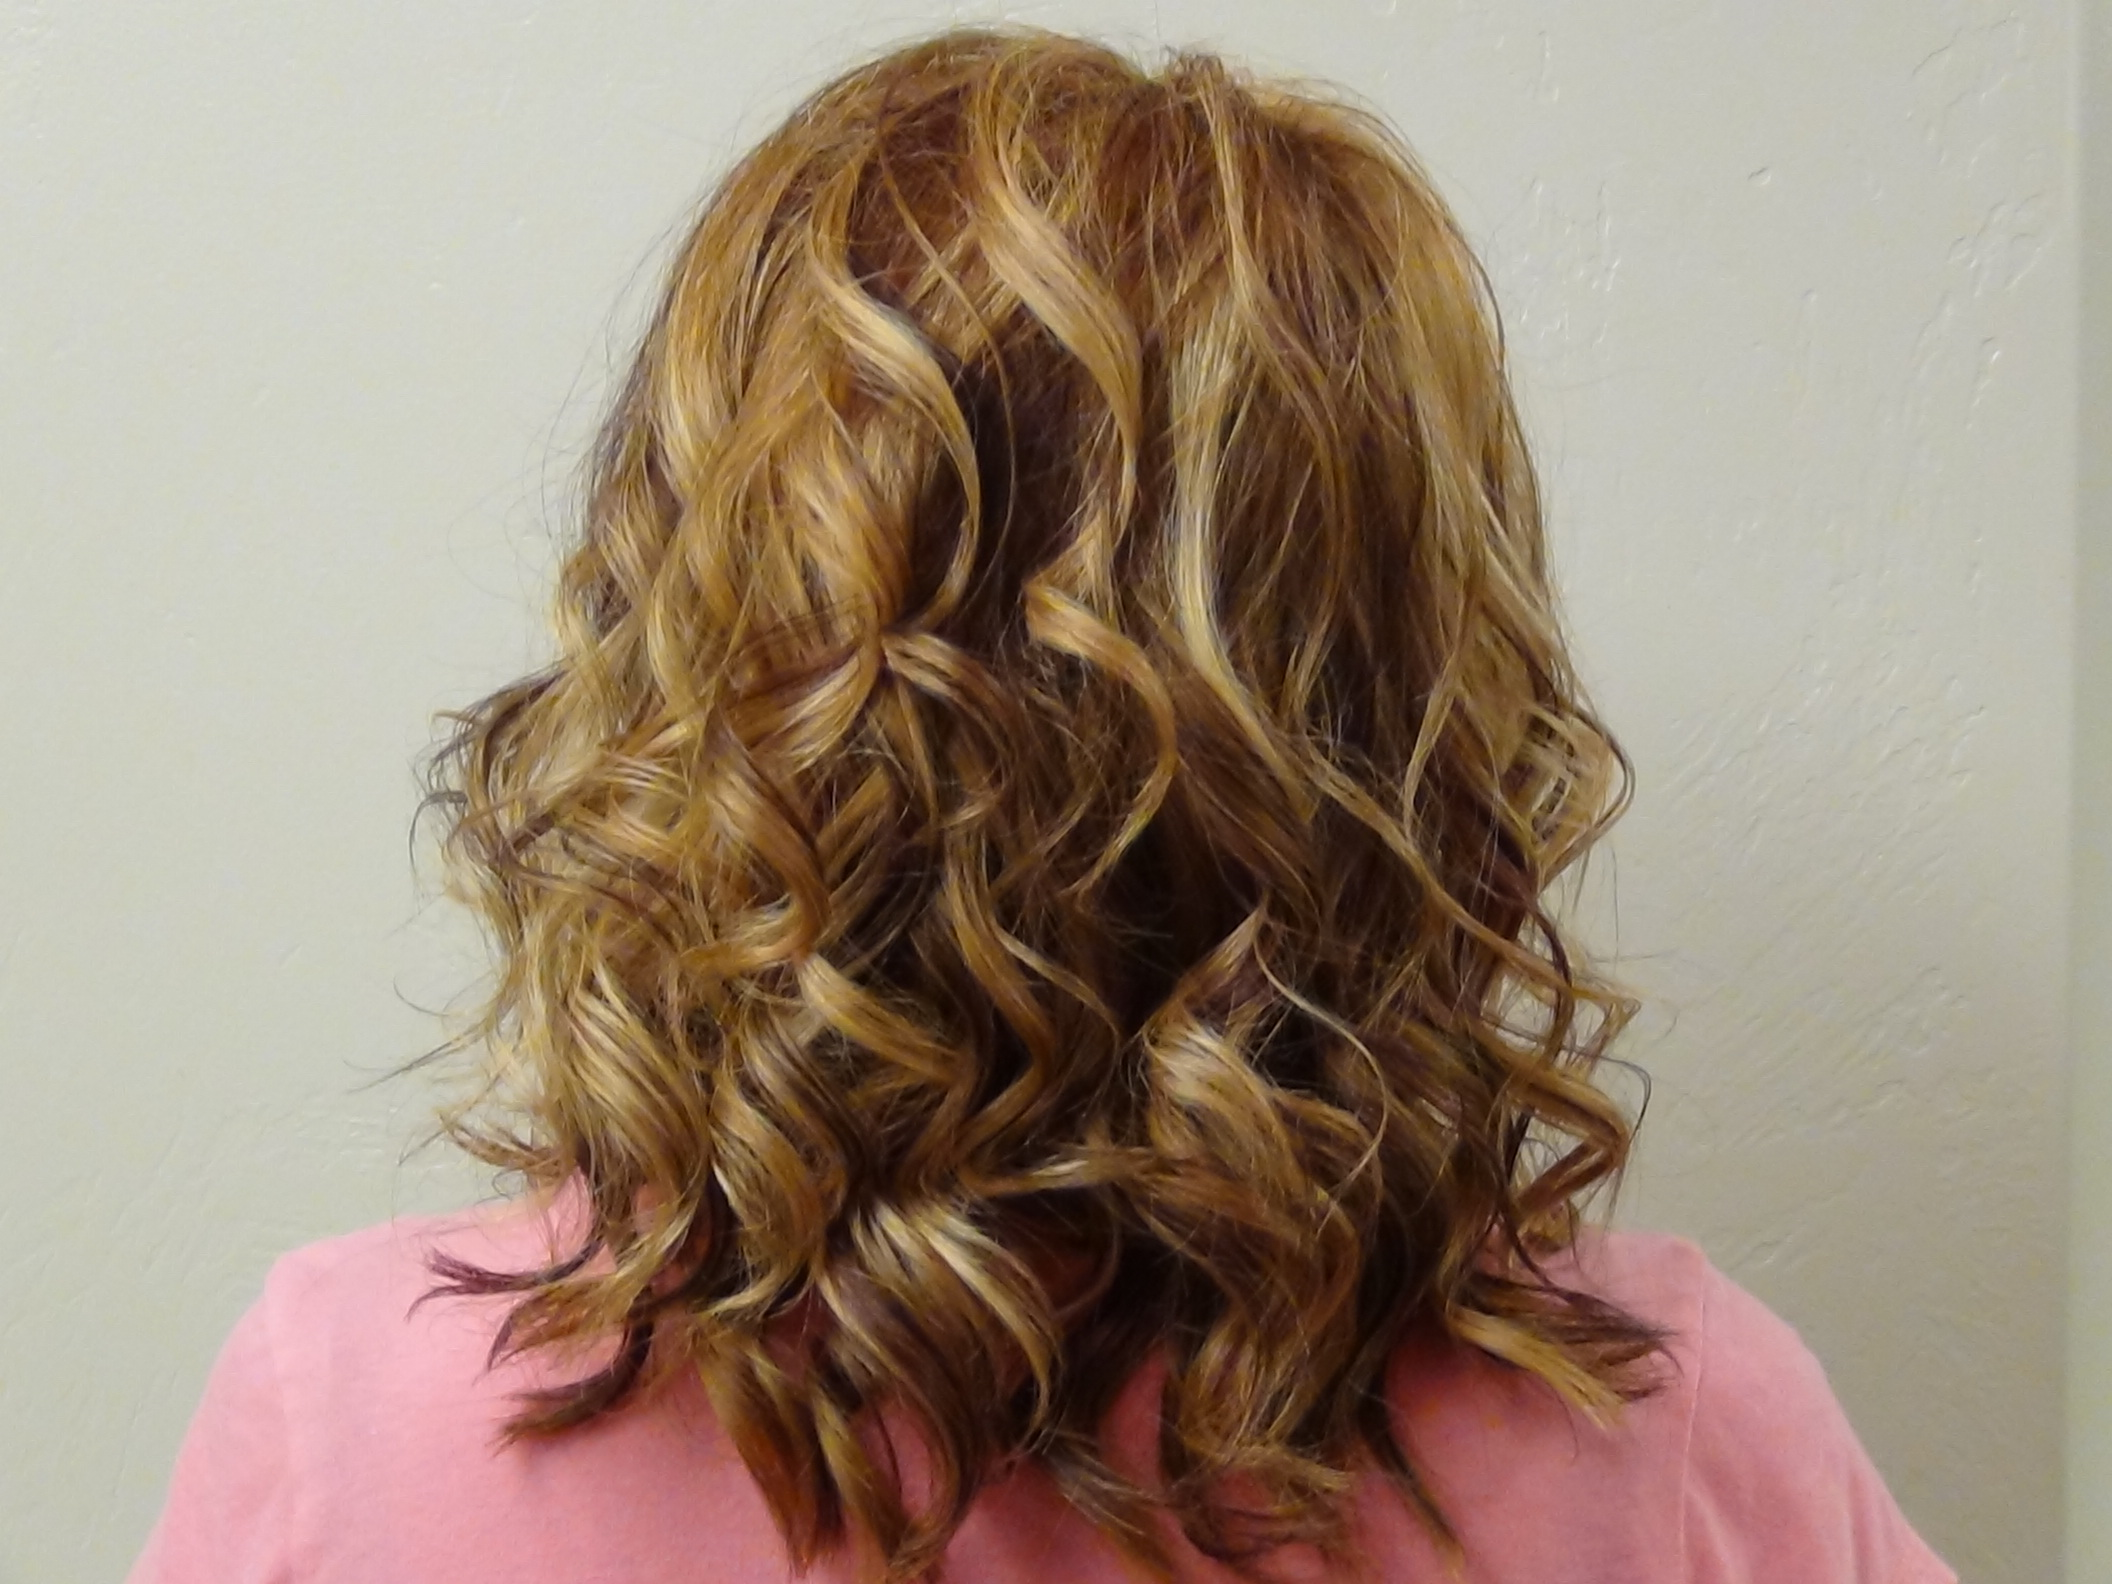 Prom Hairstyles Flat Iron Hair